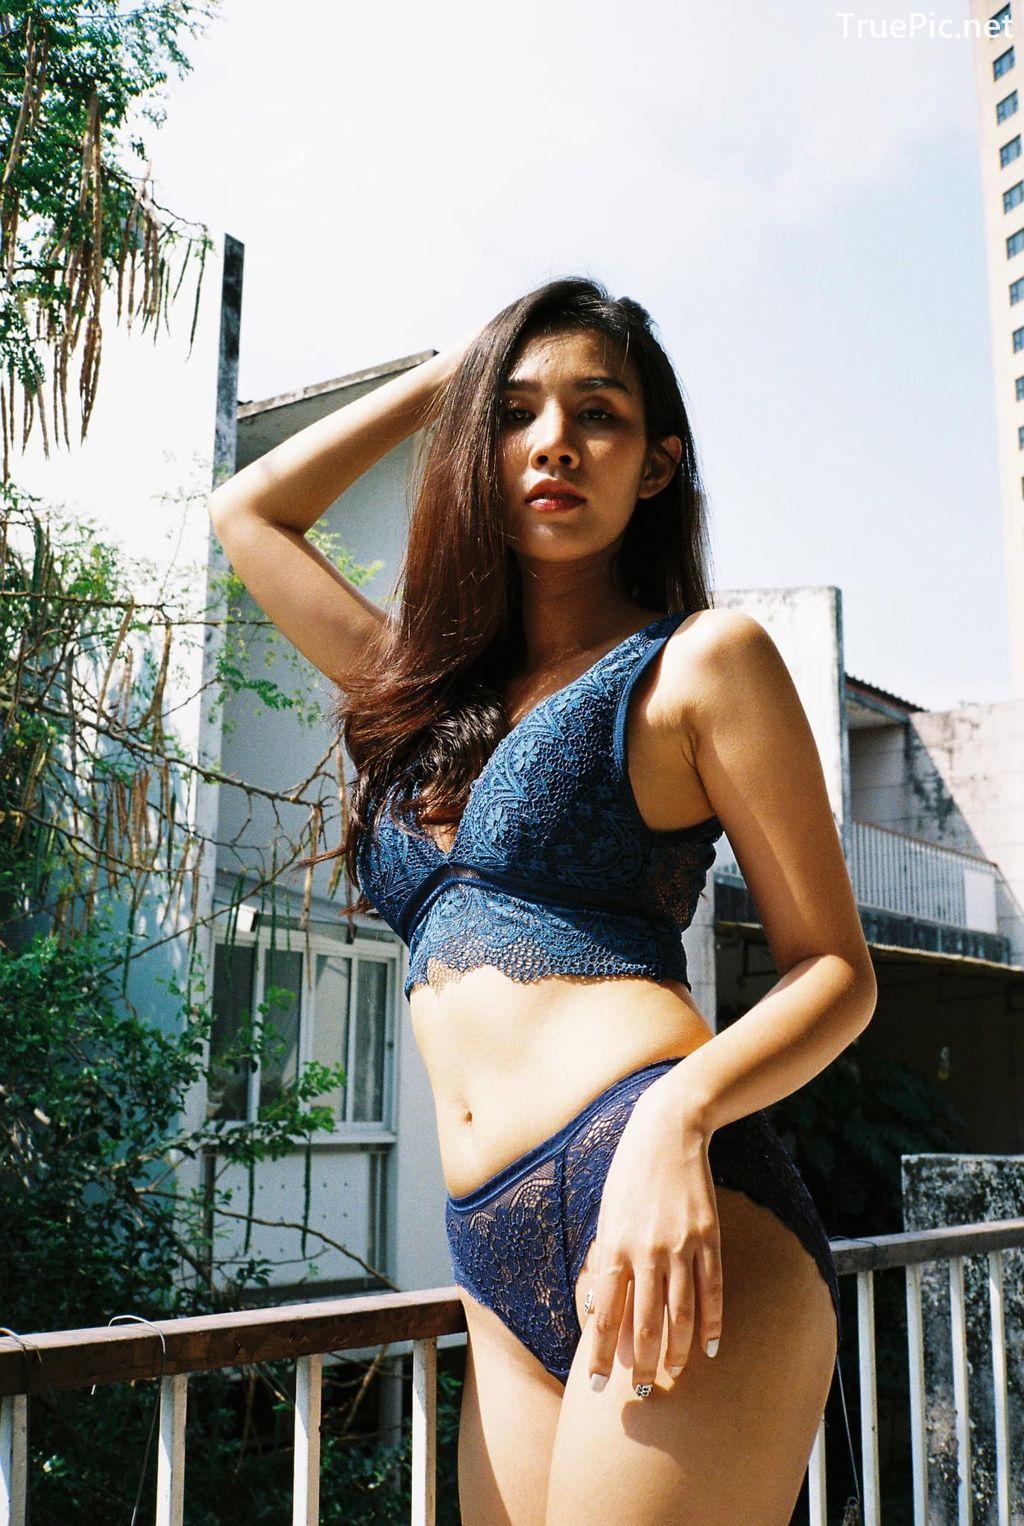 Image-Thailand-Model-Ssomch-Tanass-Blue-Lingerie-TruePic.net-TruePic.net- Picture-1